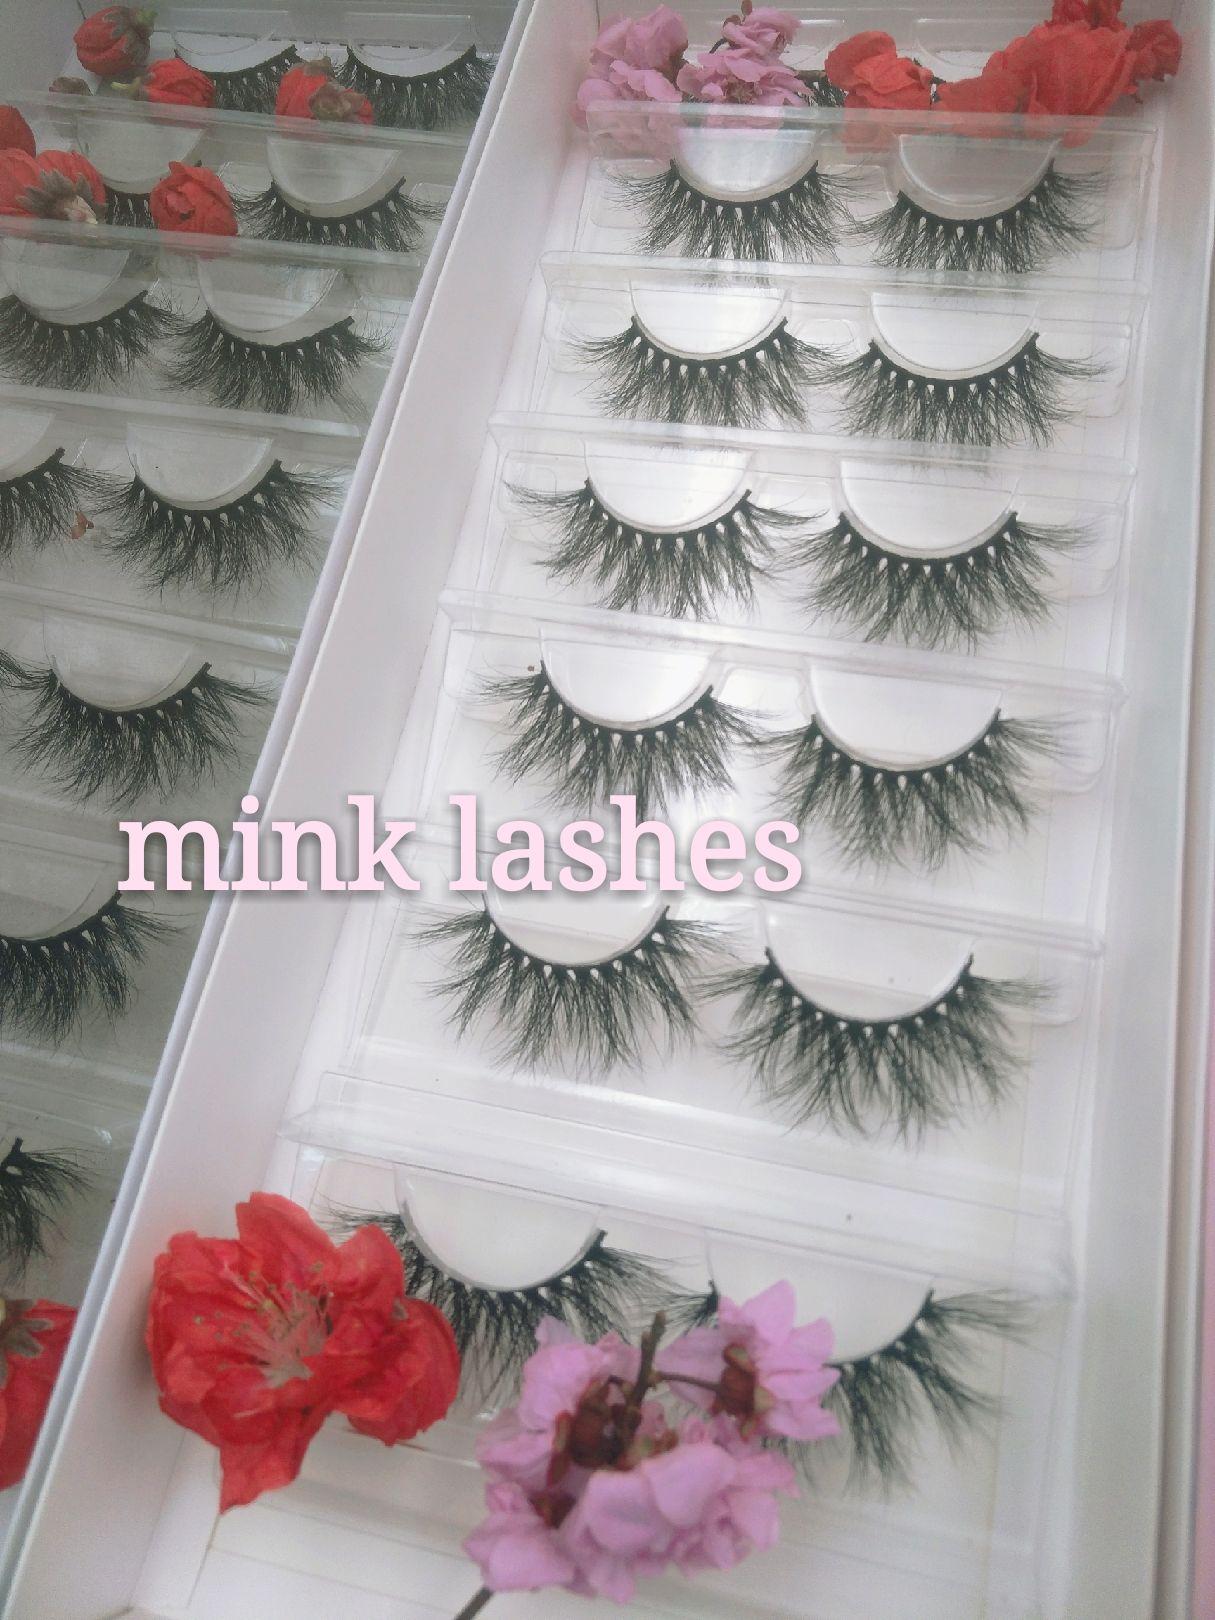 e4c97f36234 Pin by coach lashes on 3d faux mink lashes wholesale bulk horse eyelashes  good vendors for mink lashes in 2019 | Mink, Eyelashes, Lashes